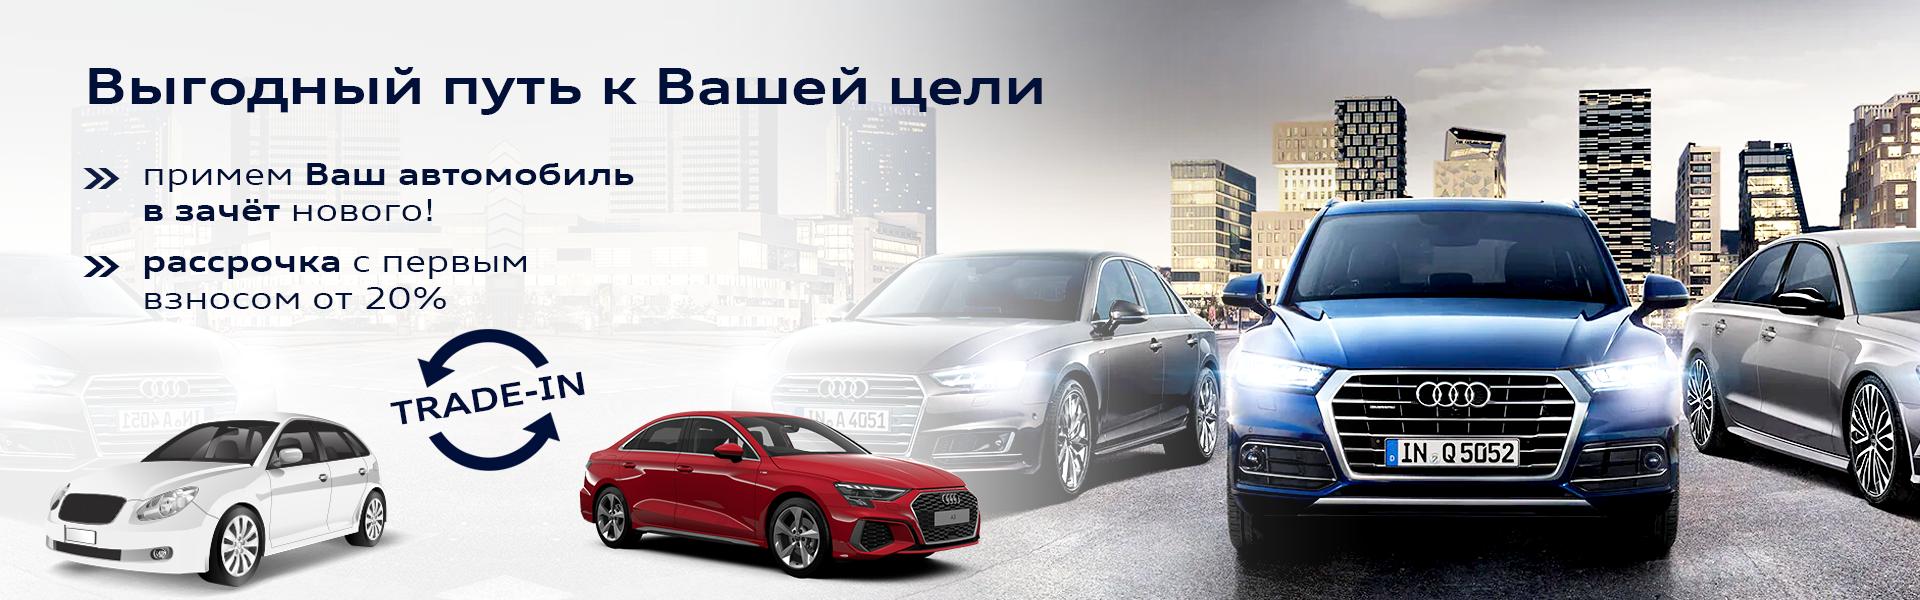 Рассрочка и trade-in Audi